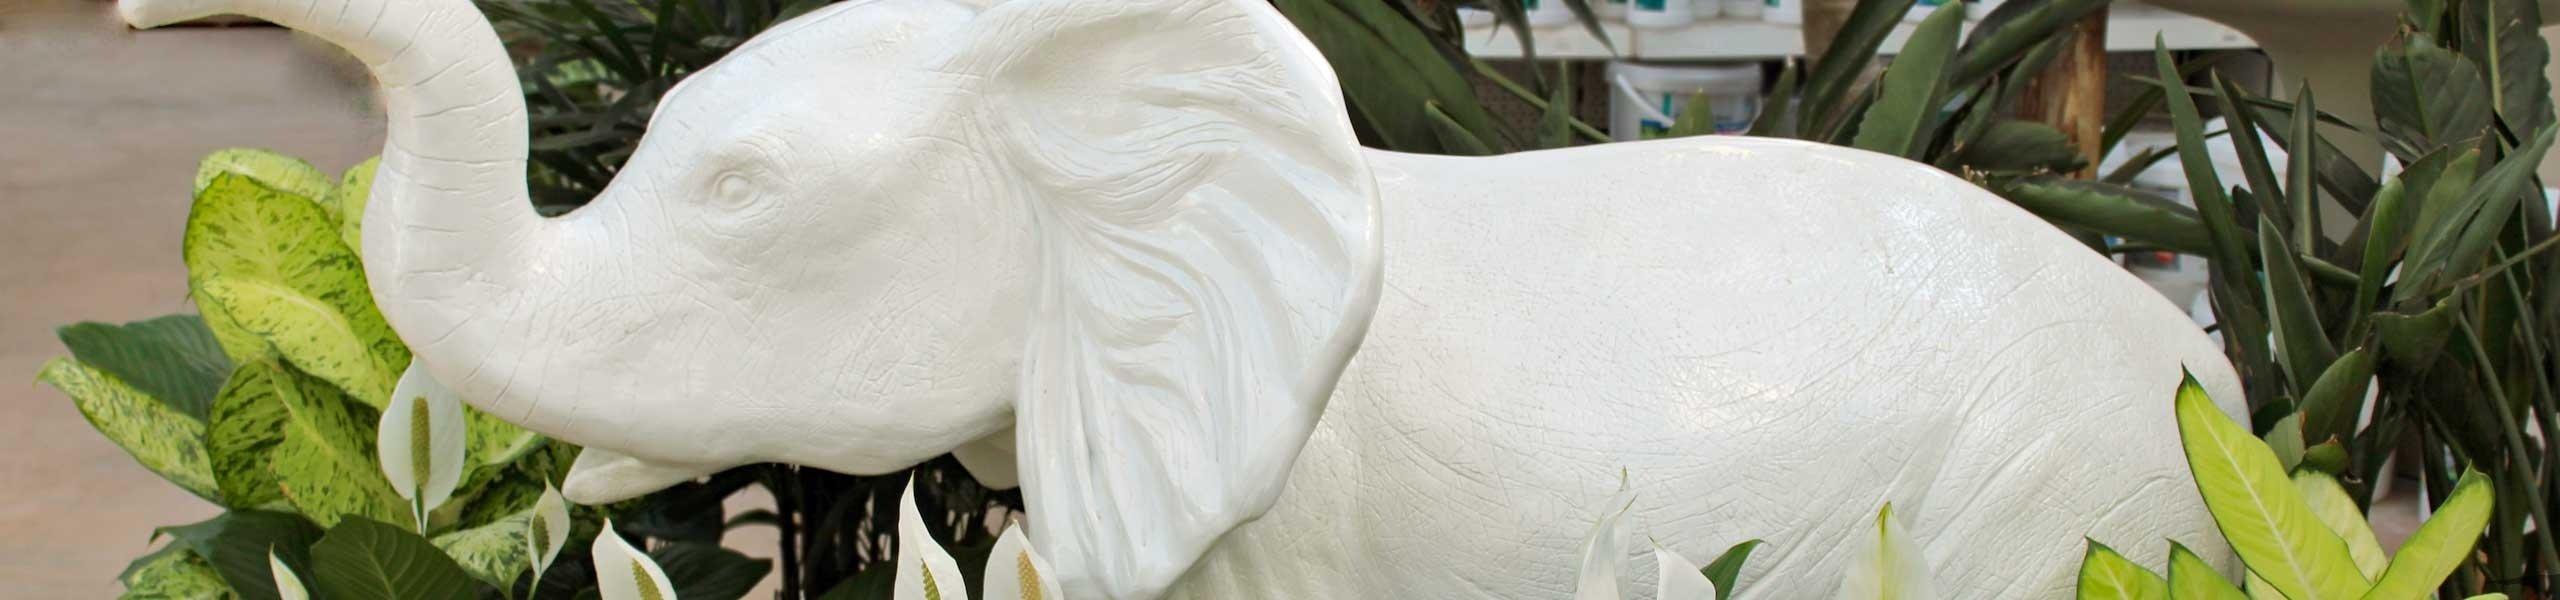 Éléphant blanc en résine